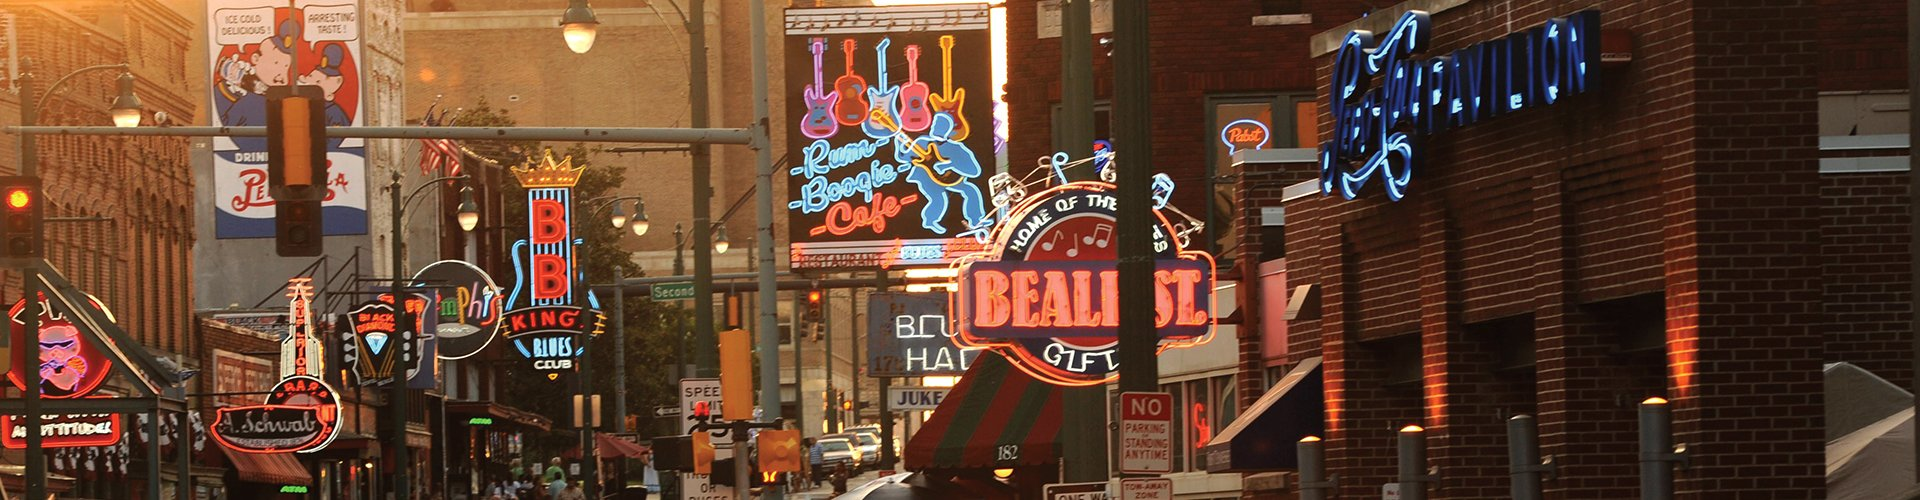 Beale Street Memphis, Amerika